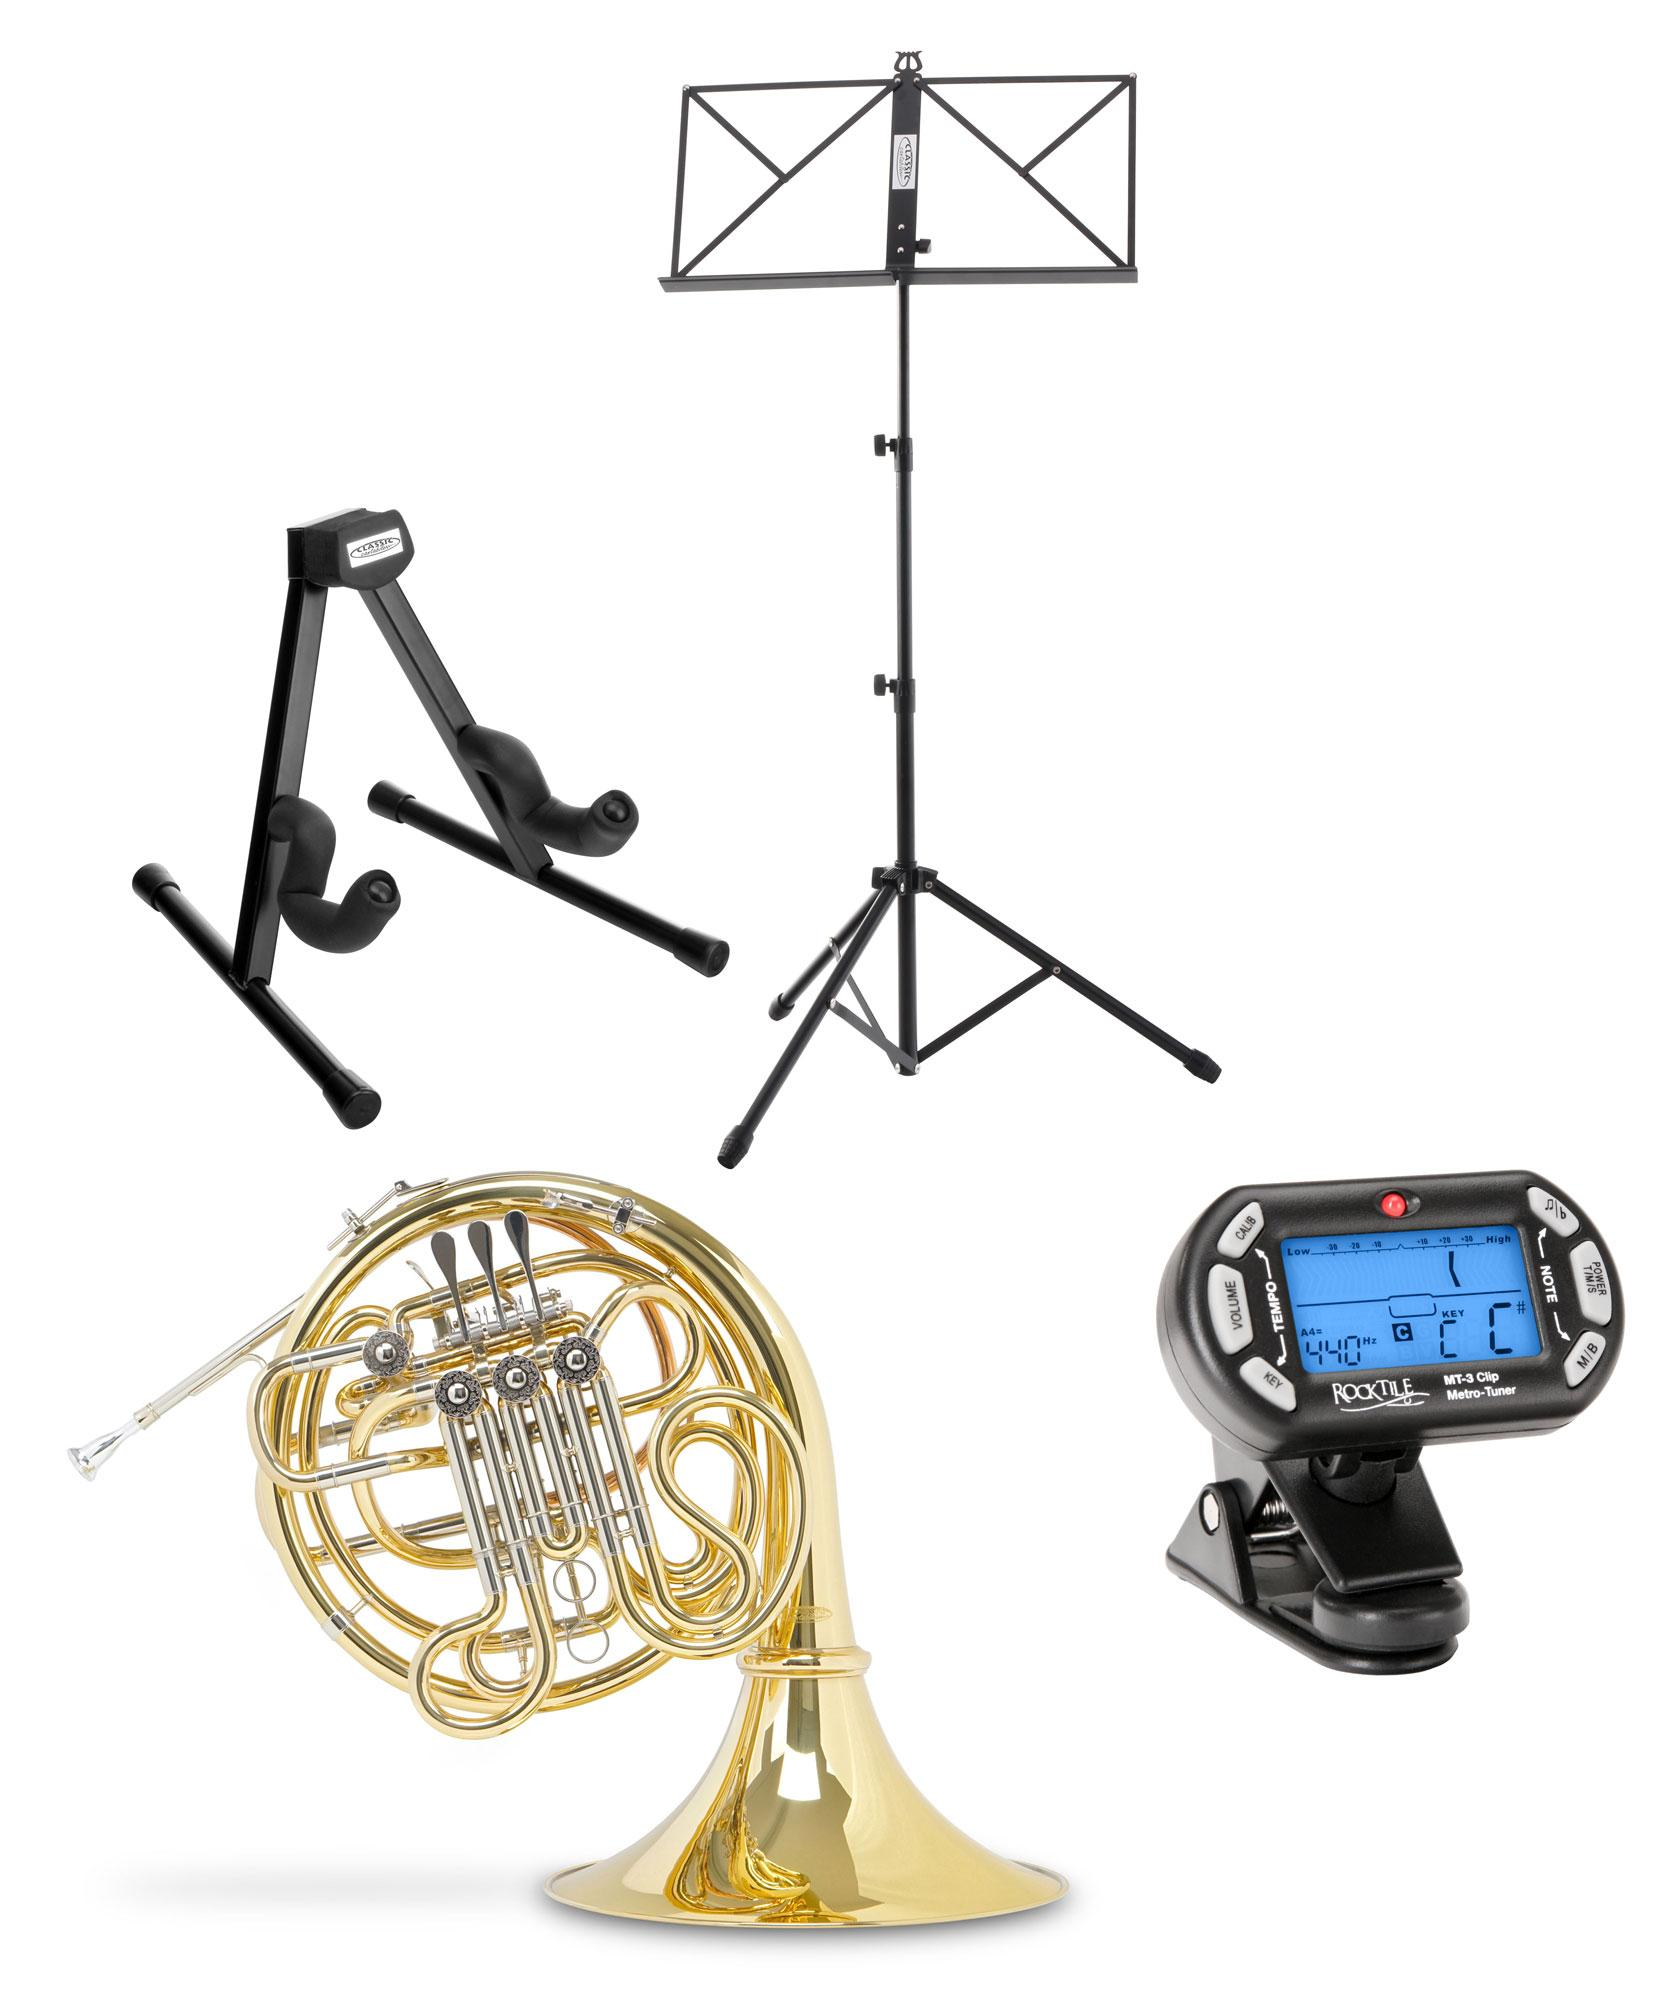 Classic Cantabile Brass WH 801L F|Bb Wald |Doppelhorn Set inkl. Koffer, Mundstück, Notenständer, Metronom, Hornständer